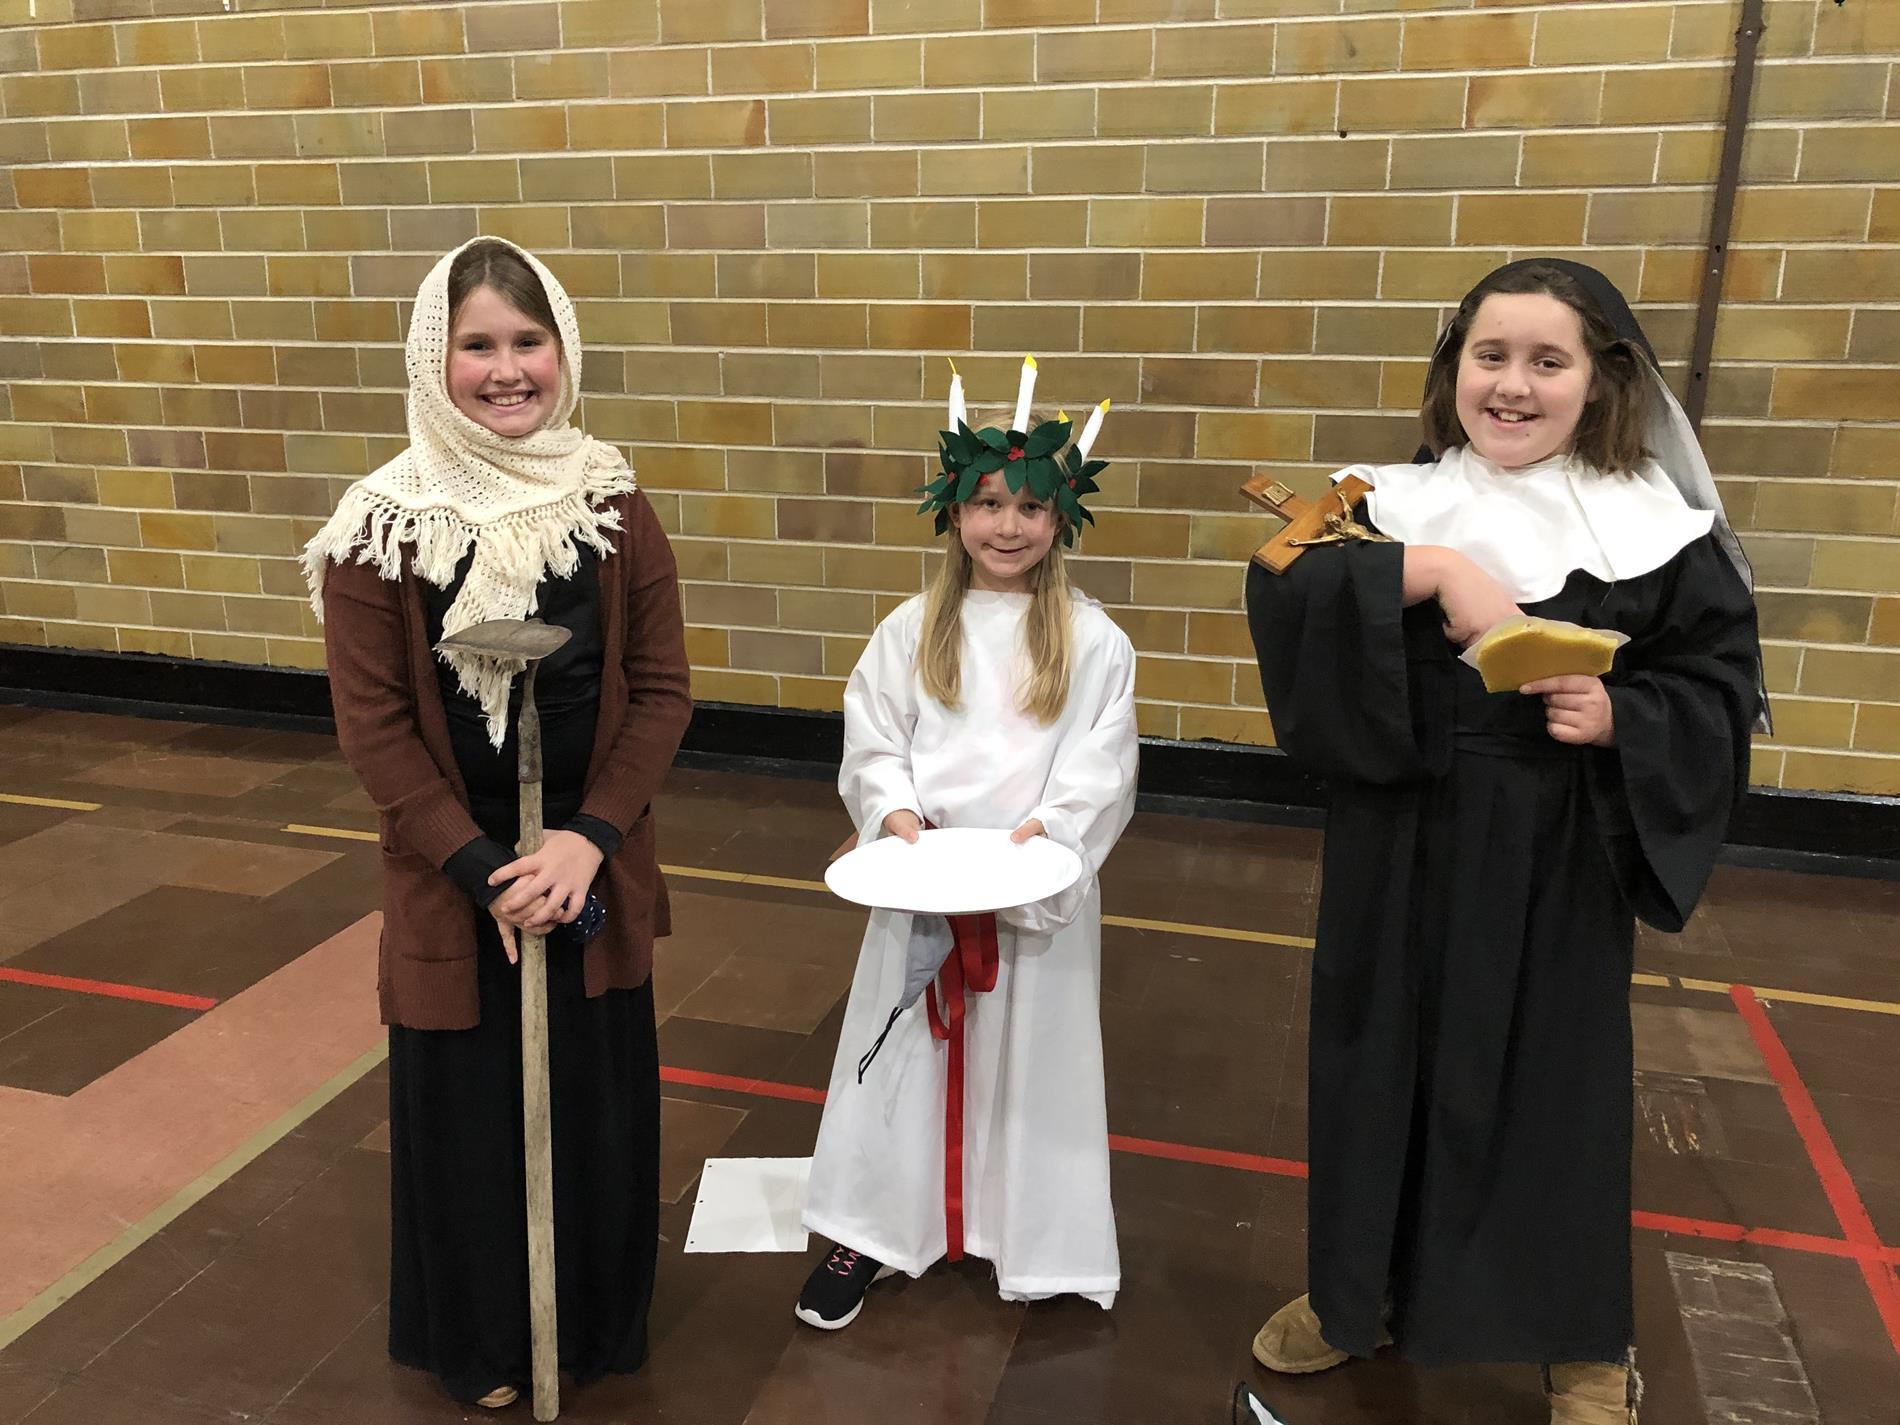 Three children dressed as saints